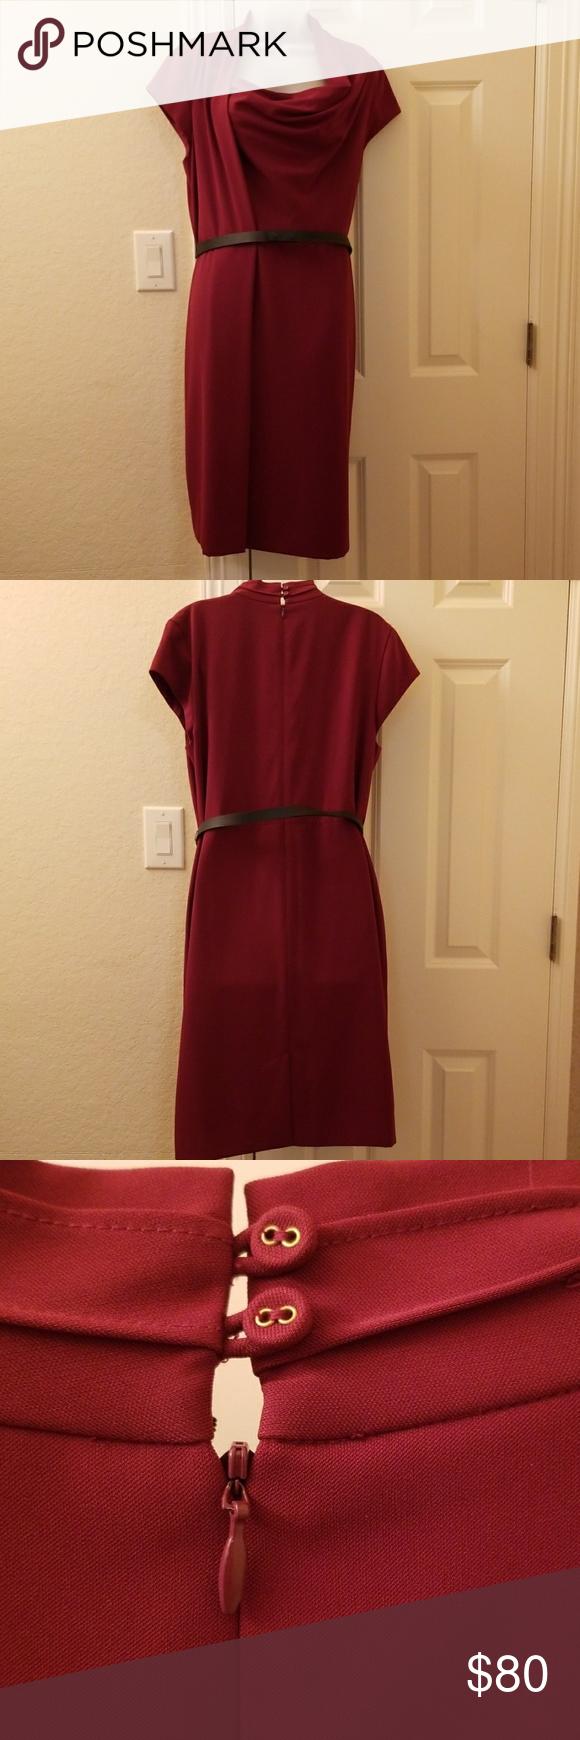 Nordstrom Brick Red Dress Red Dress Sophisticated Dress Nordstrom Dresses [ 1740 x 580 Pixel ]